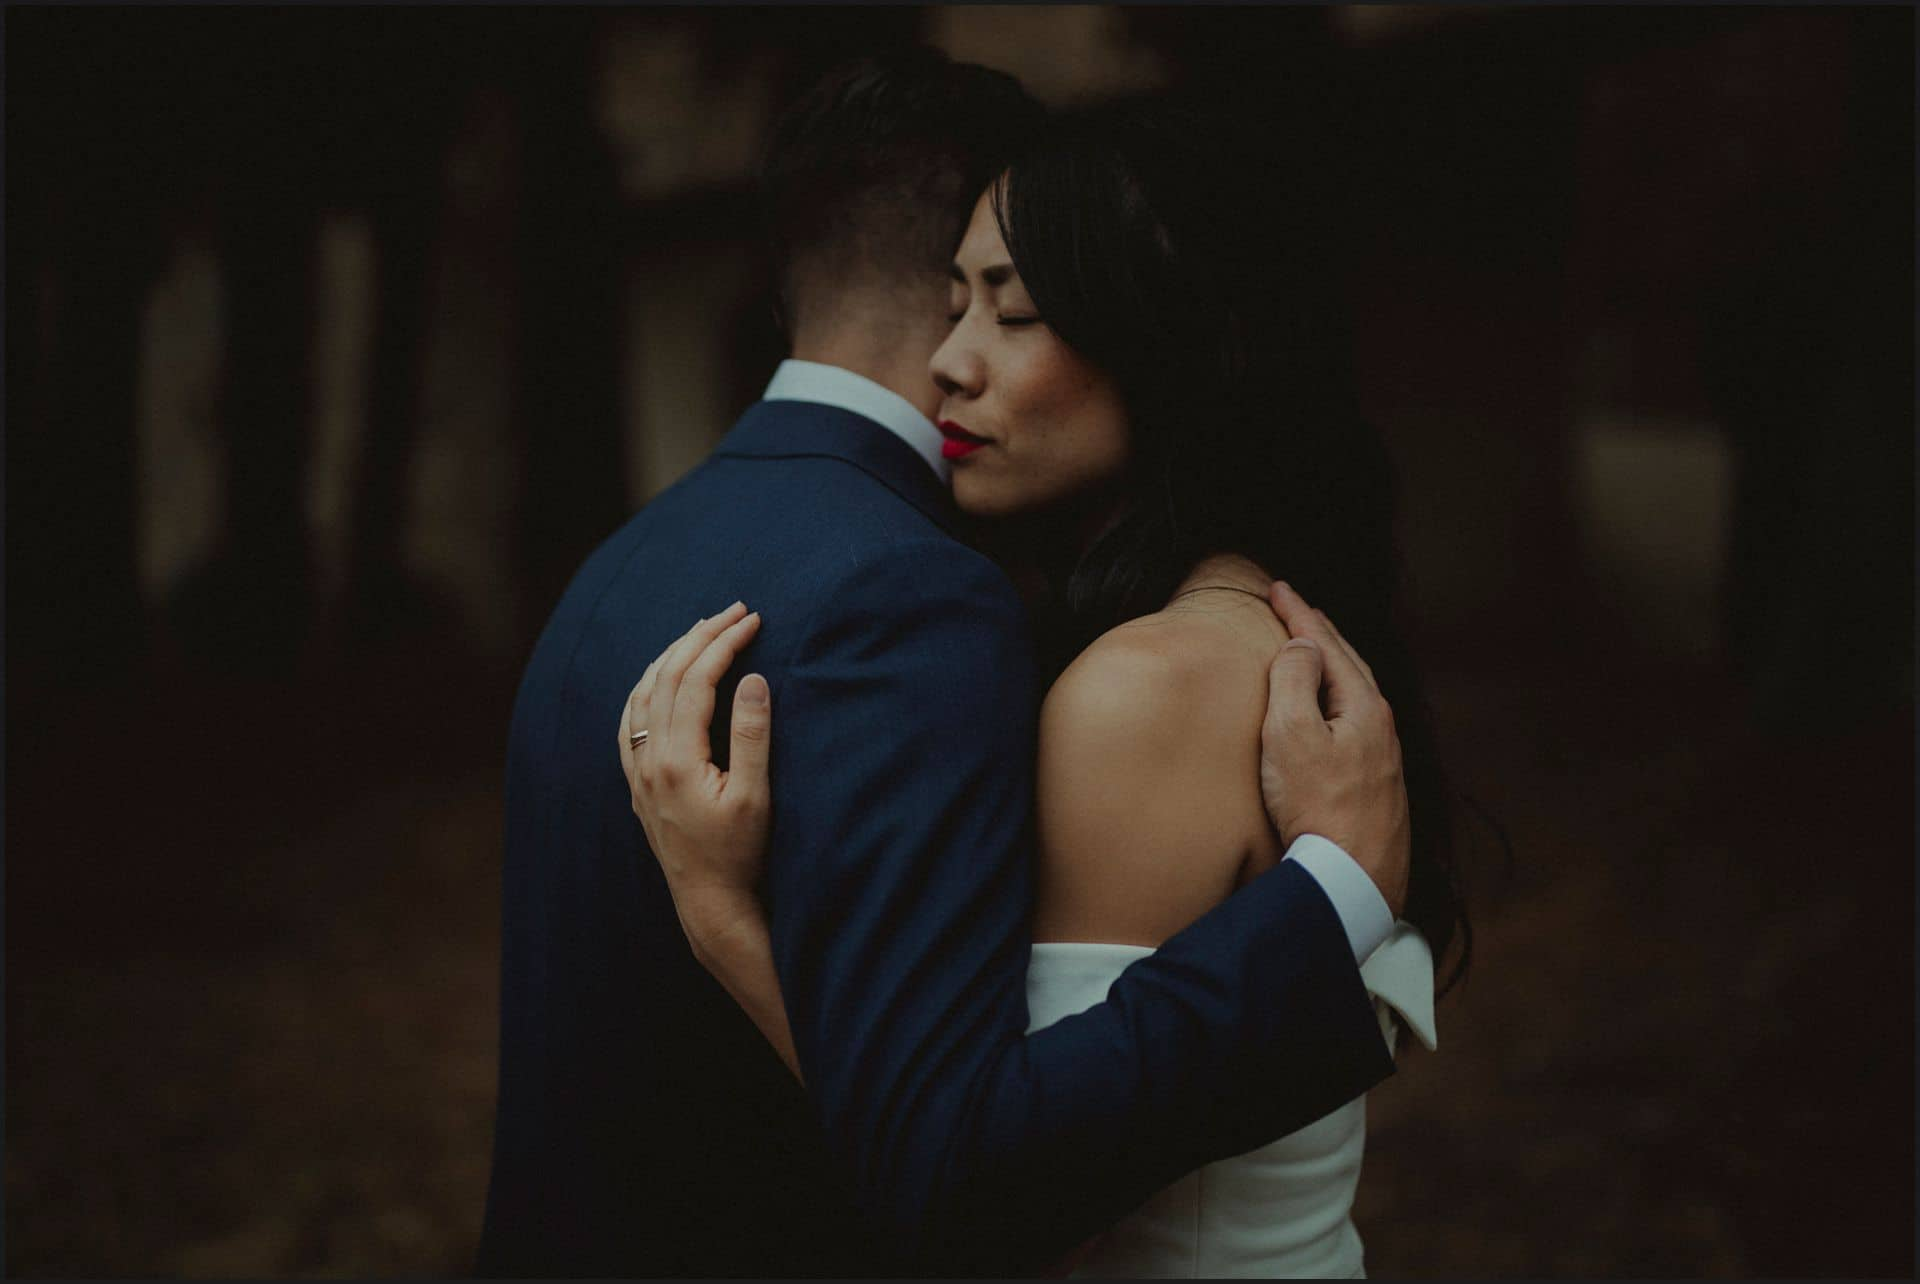 destination wedding, castello del trebbio, tuscany, bride, groom, romantic, hug